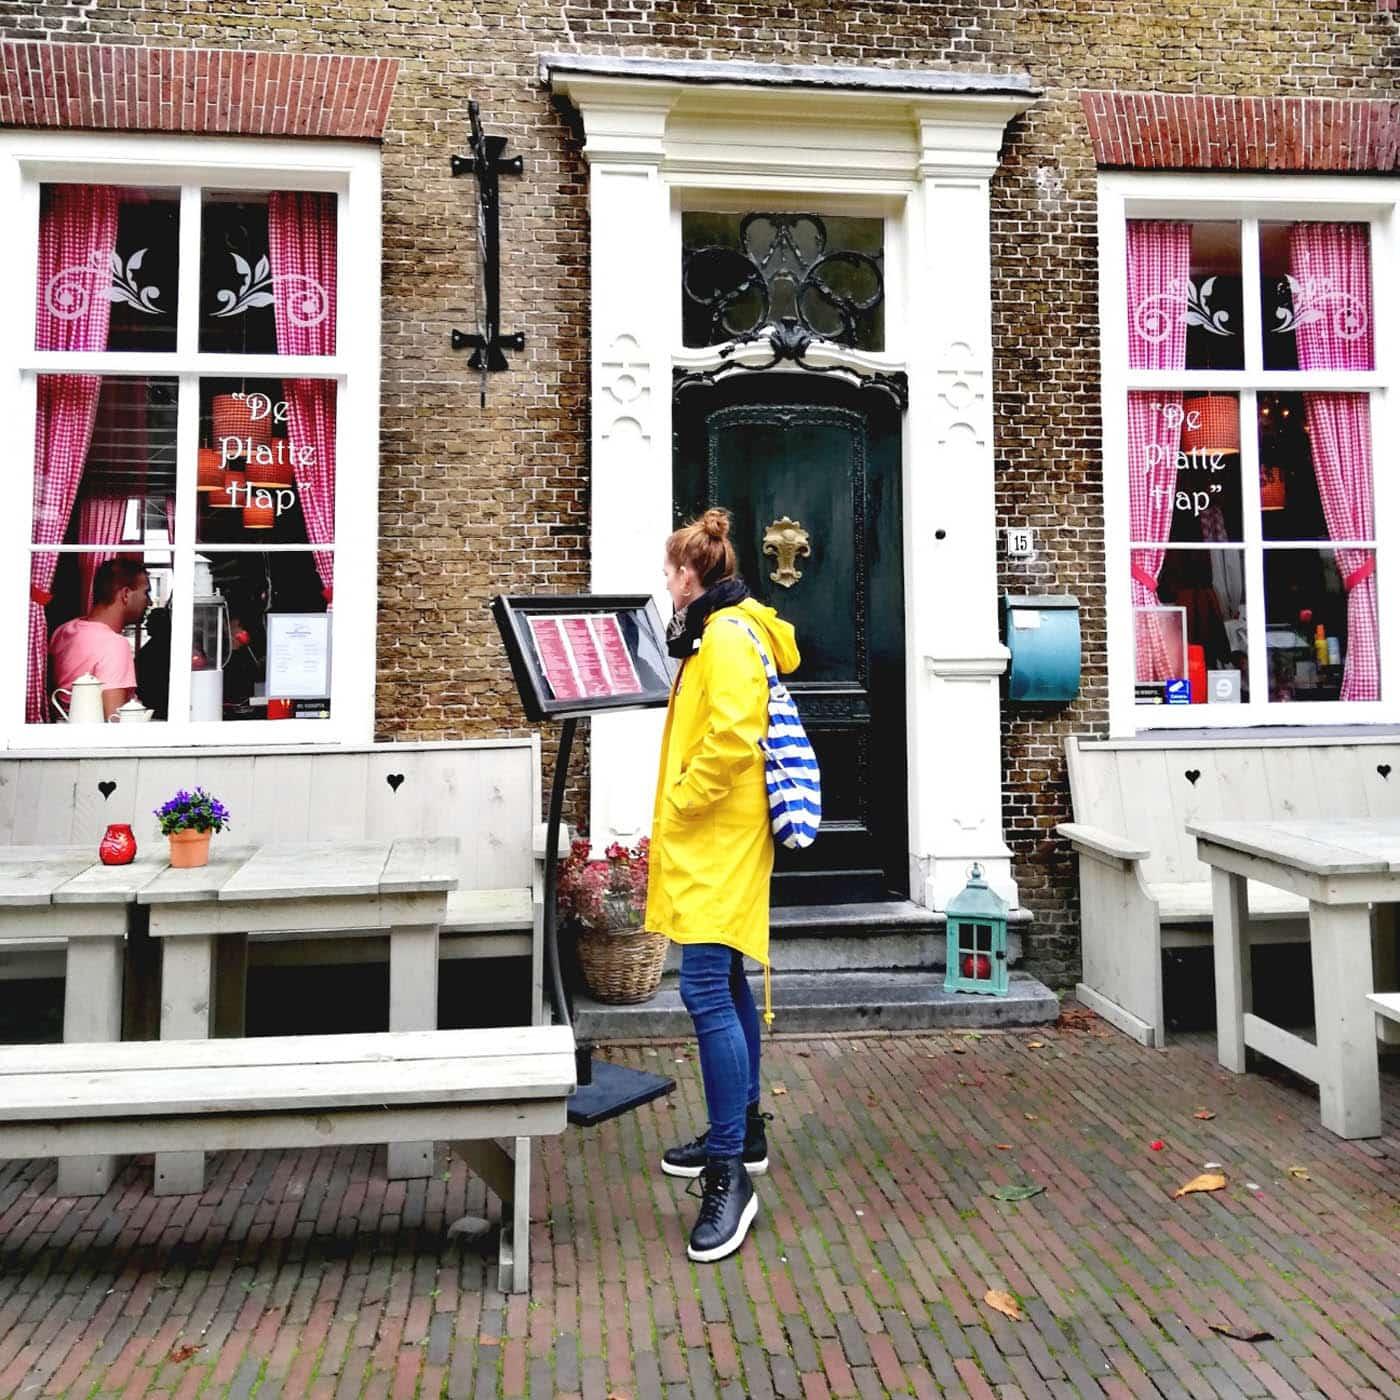 Familienurlaub in Zeeland, Niederlande: Pannekoekenhuis mit Kindern // HIMBEER